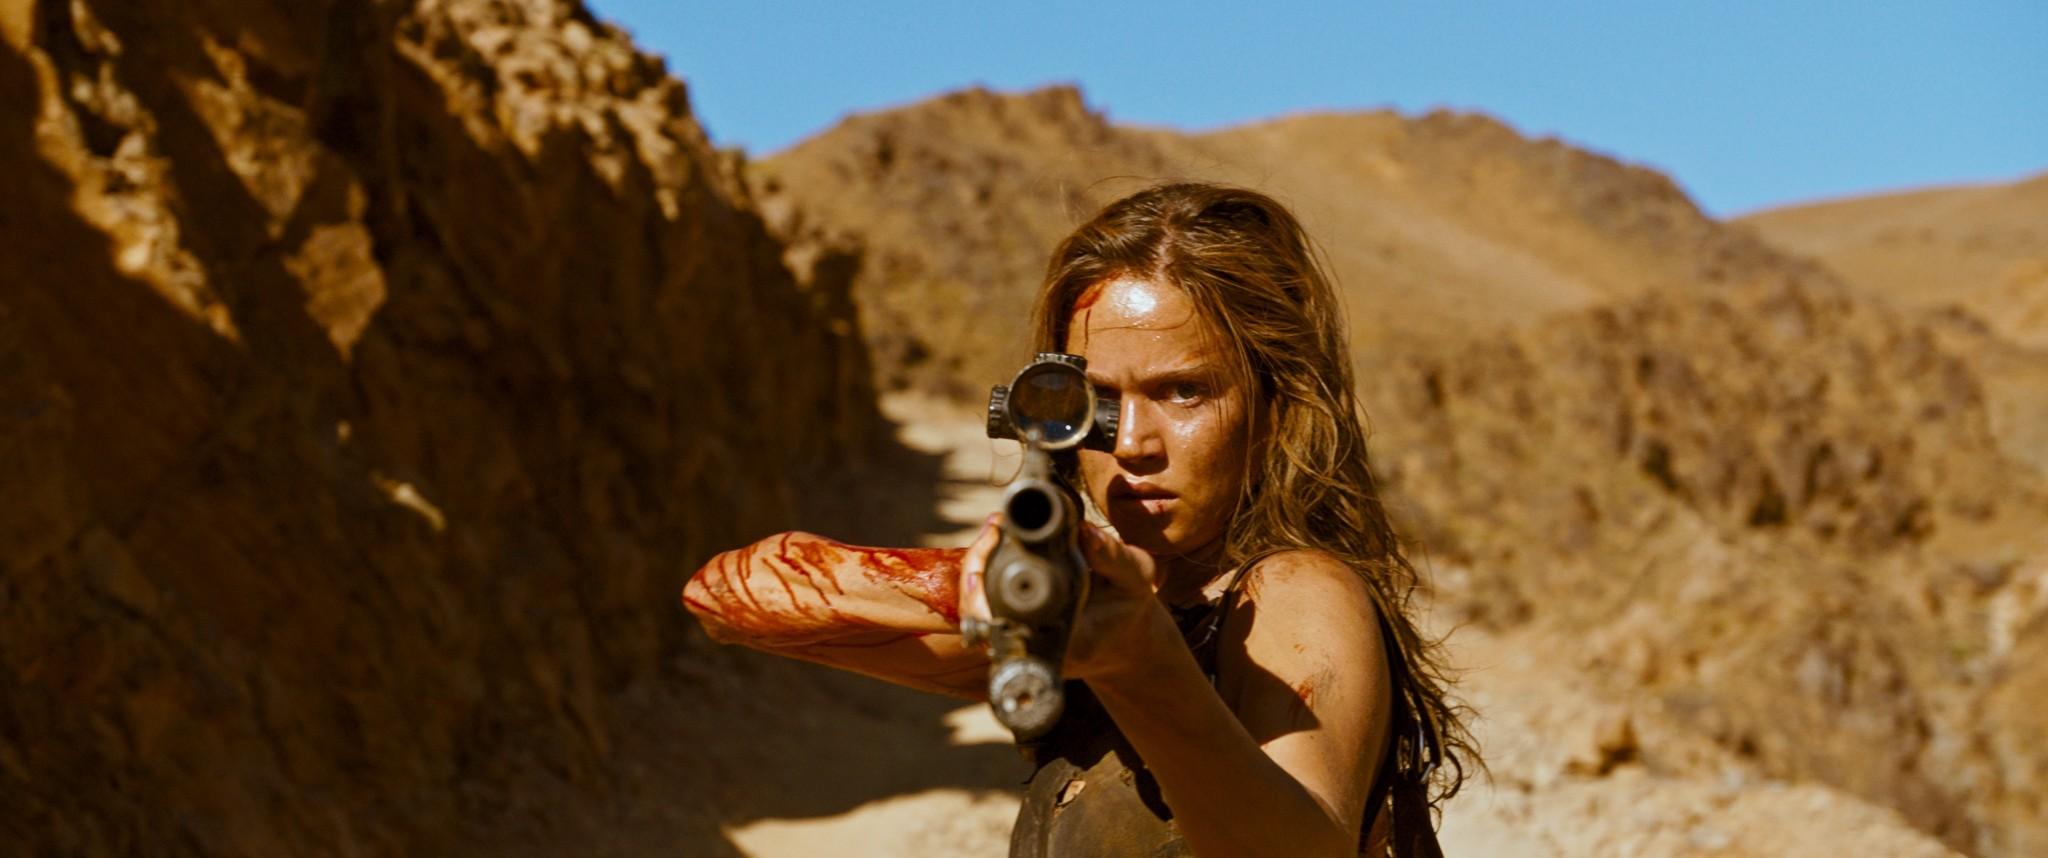 Matilda-Lutz_actress_Revenge_Coralie-Fargeat-2017_5.jpg